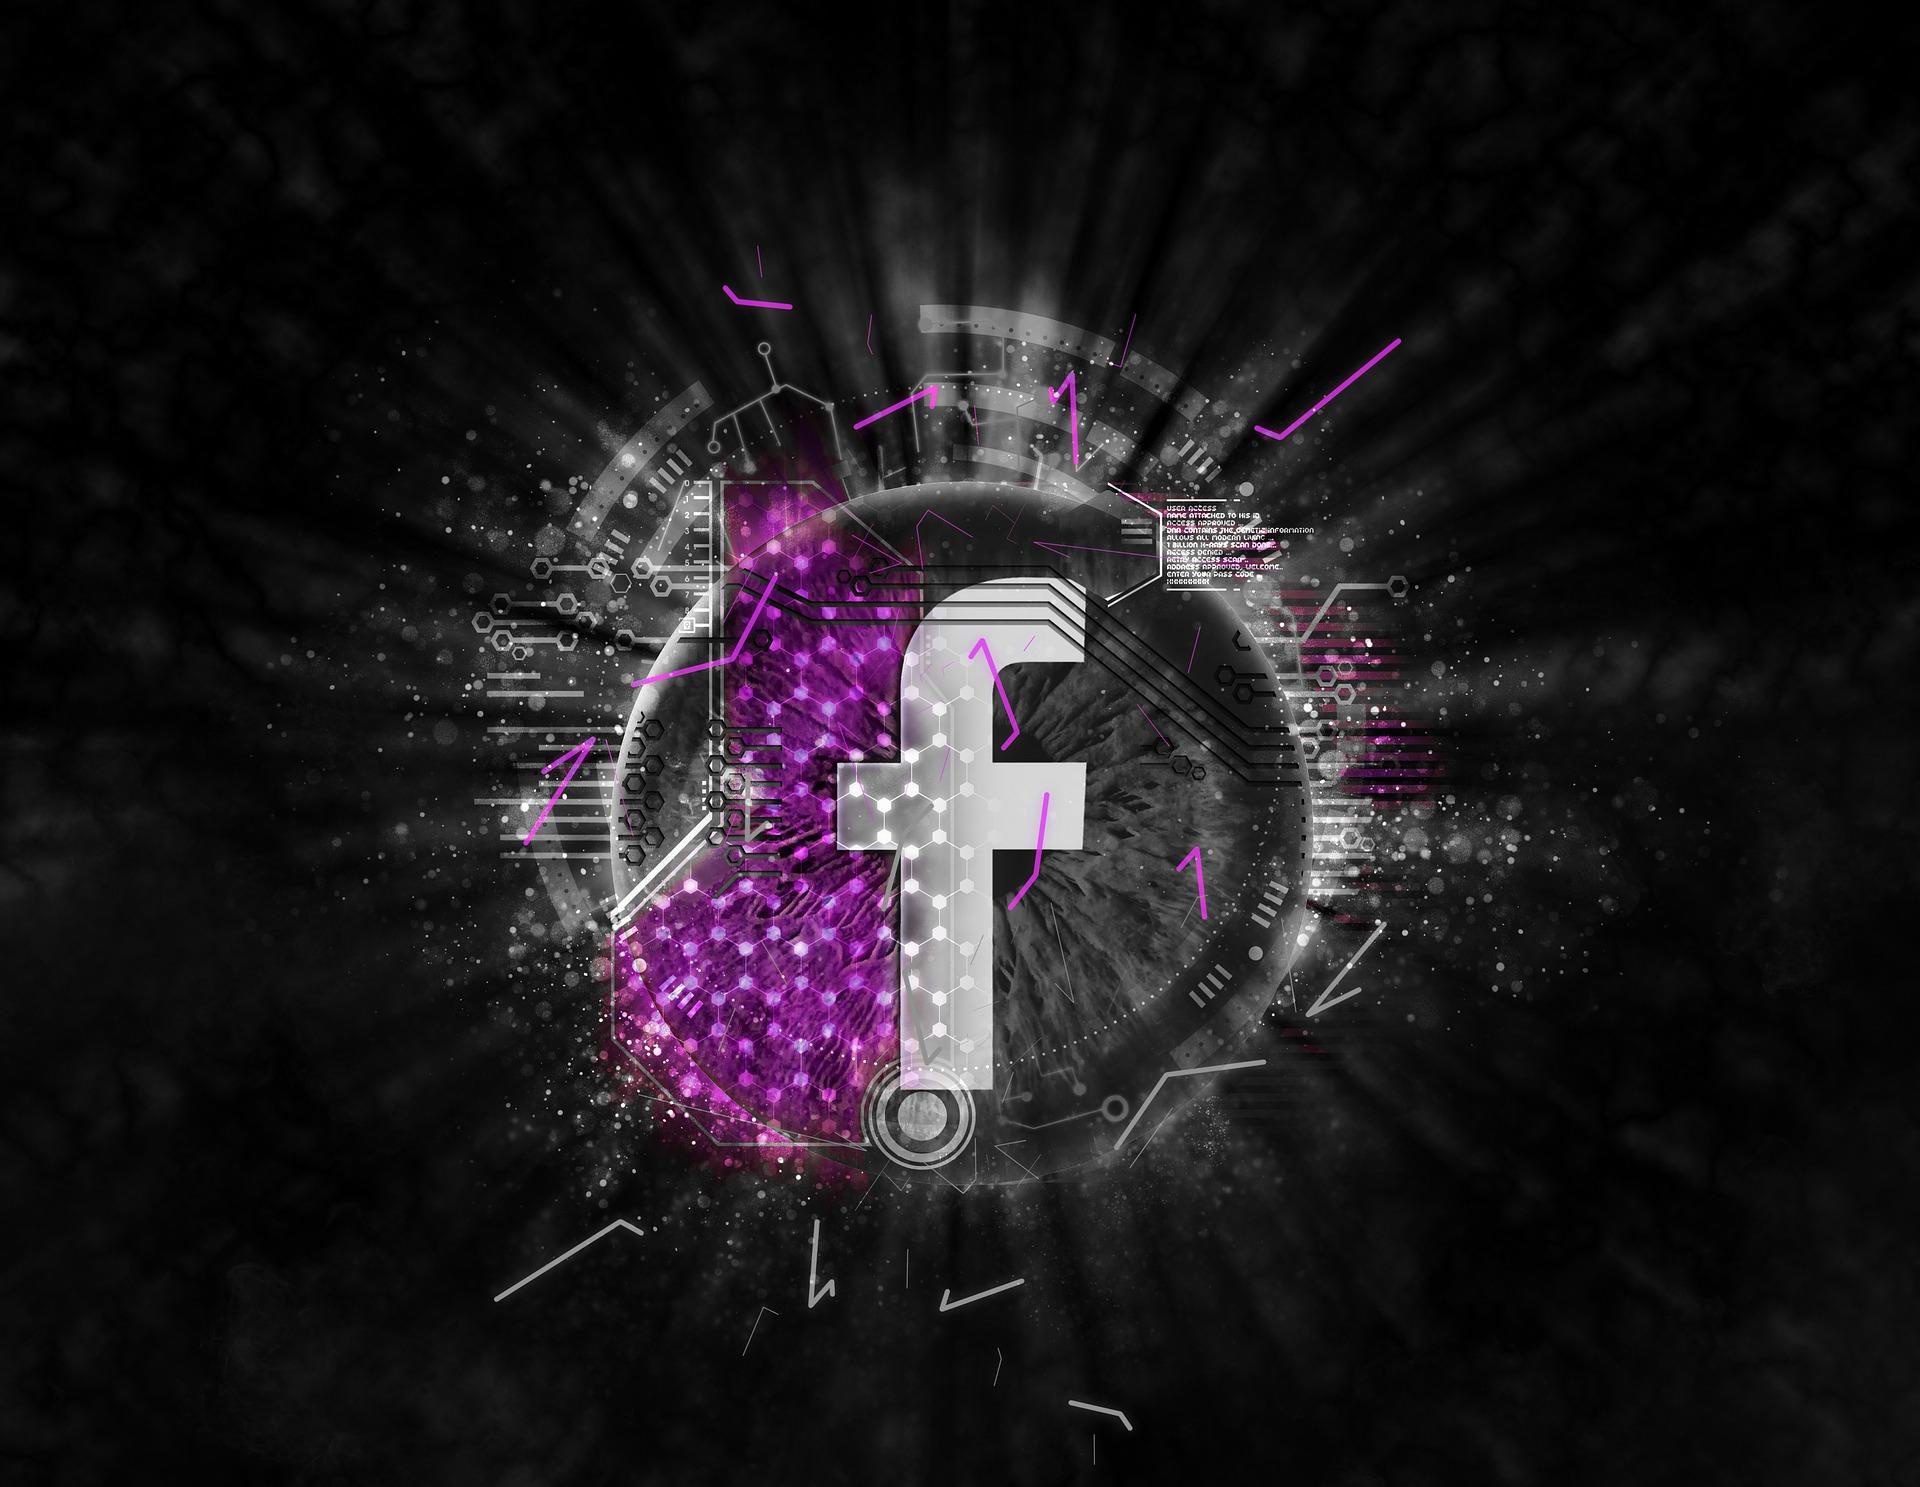 facebook_3391214_1920.jpg